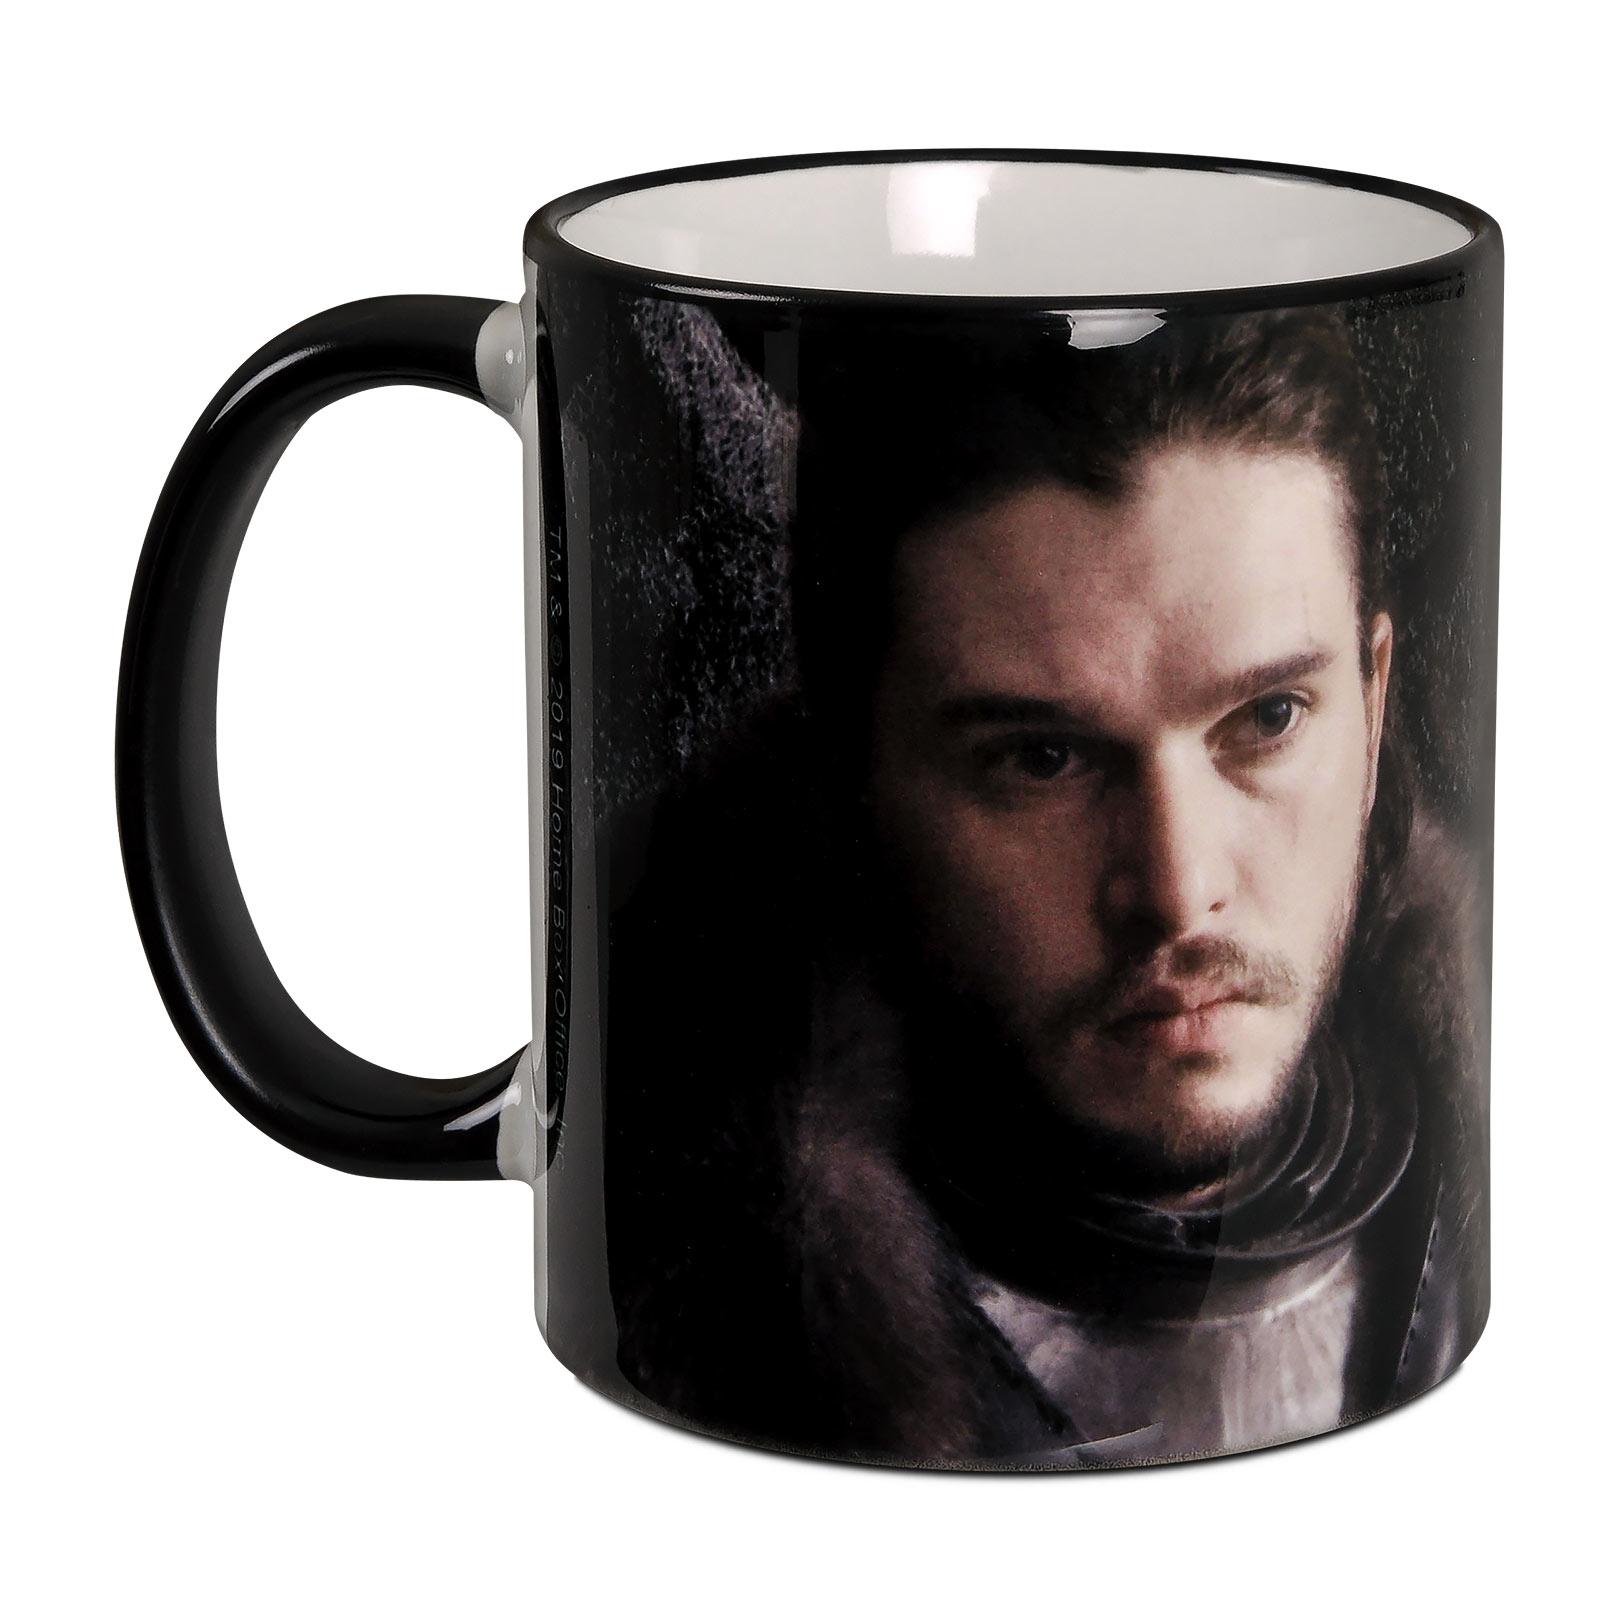 Jon Snow For The Throne Tasse - Game of Thrones